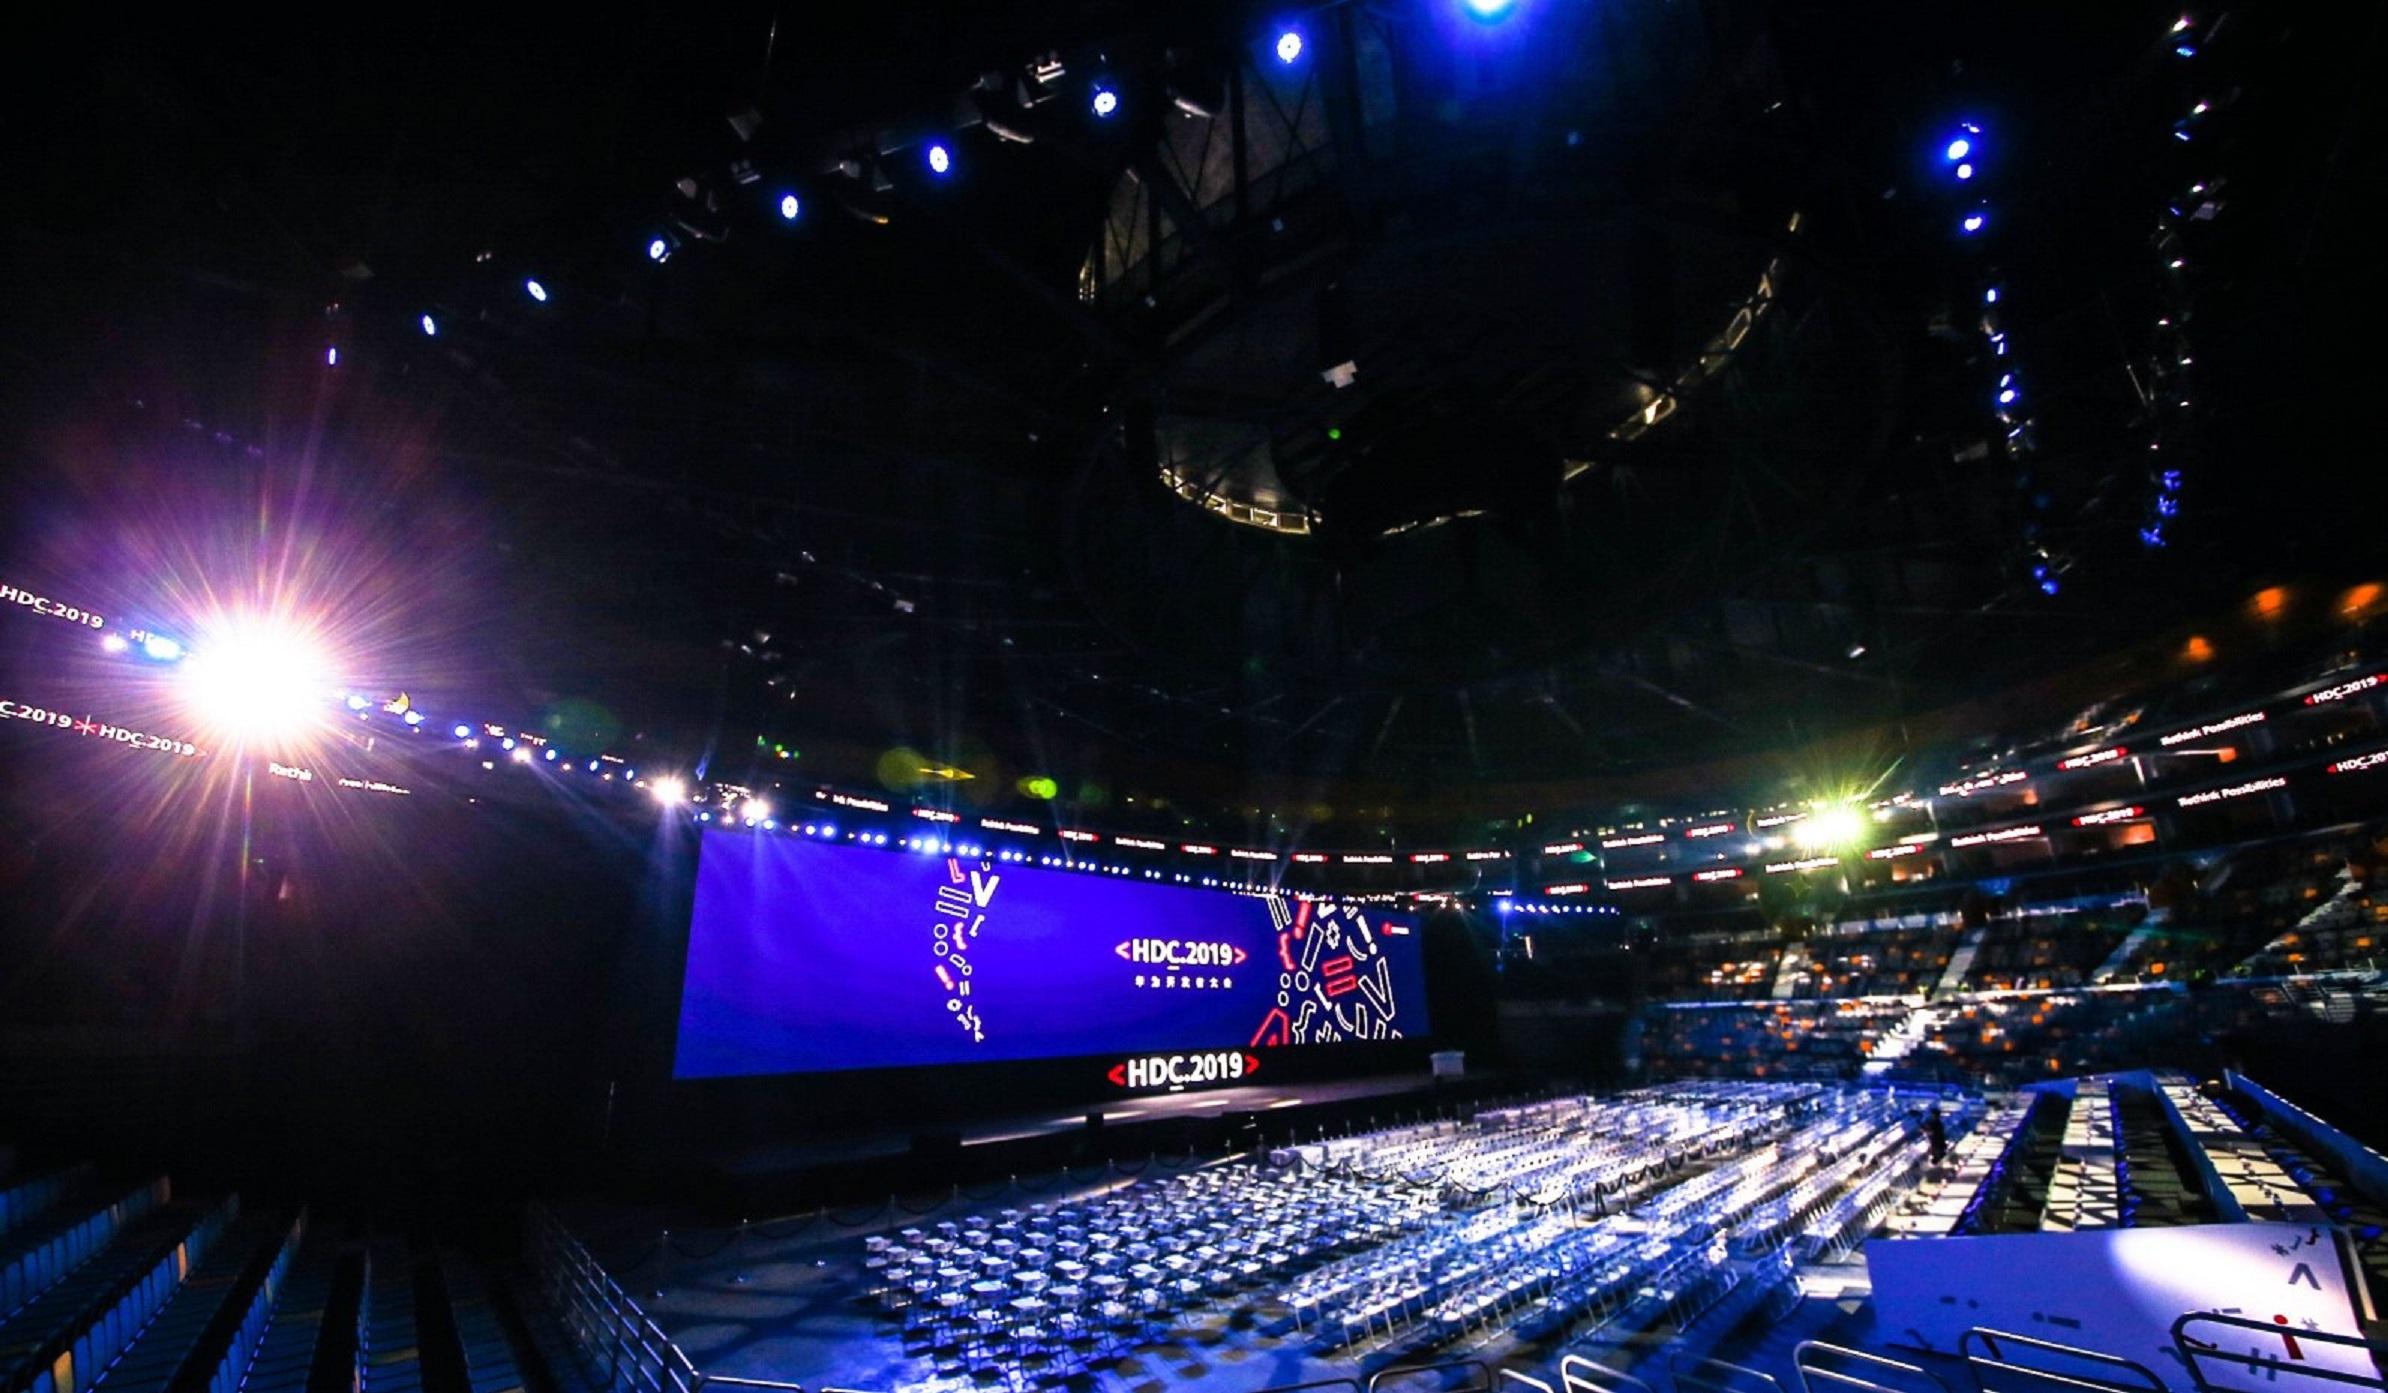 HUAWEI】2019 HUAWEI全球開發者大會_現場照片3